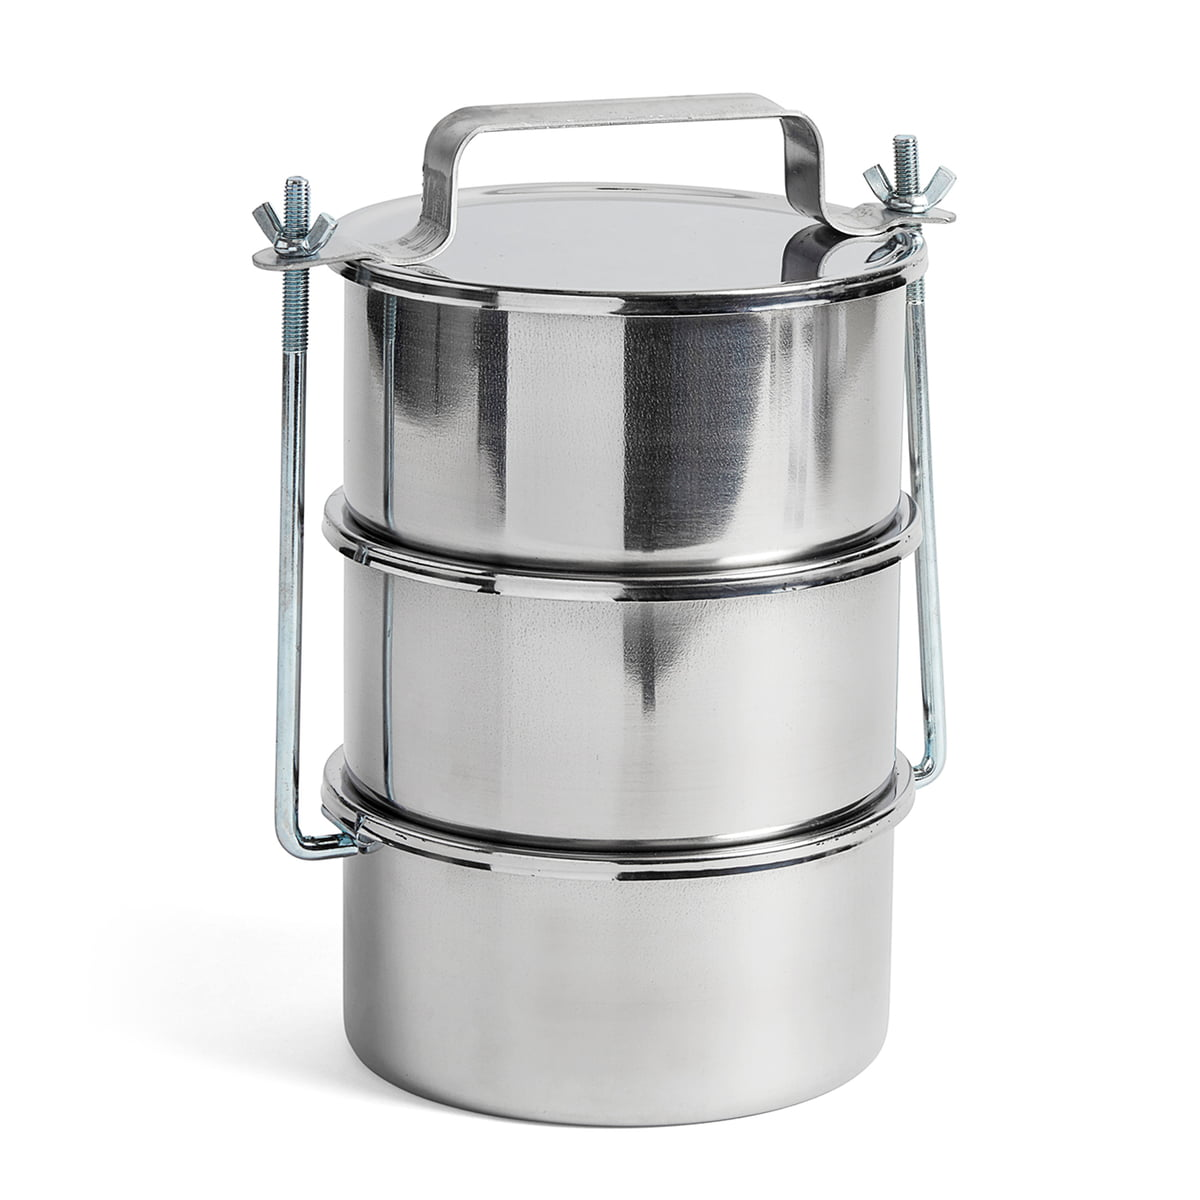 Hay - Picknick Container L, Edelstahl   Büro > Büroschränke > Container   Edelstahl   Edelstahl   Hay